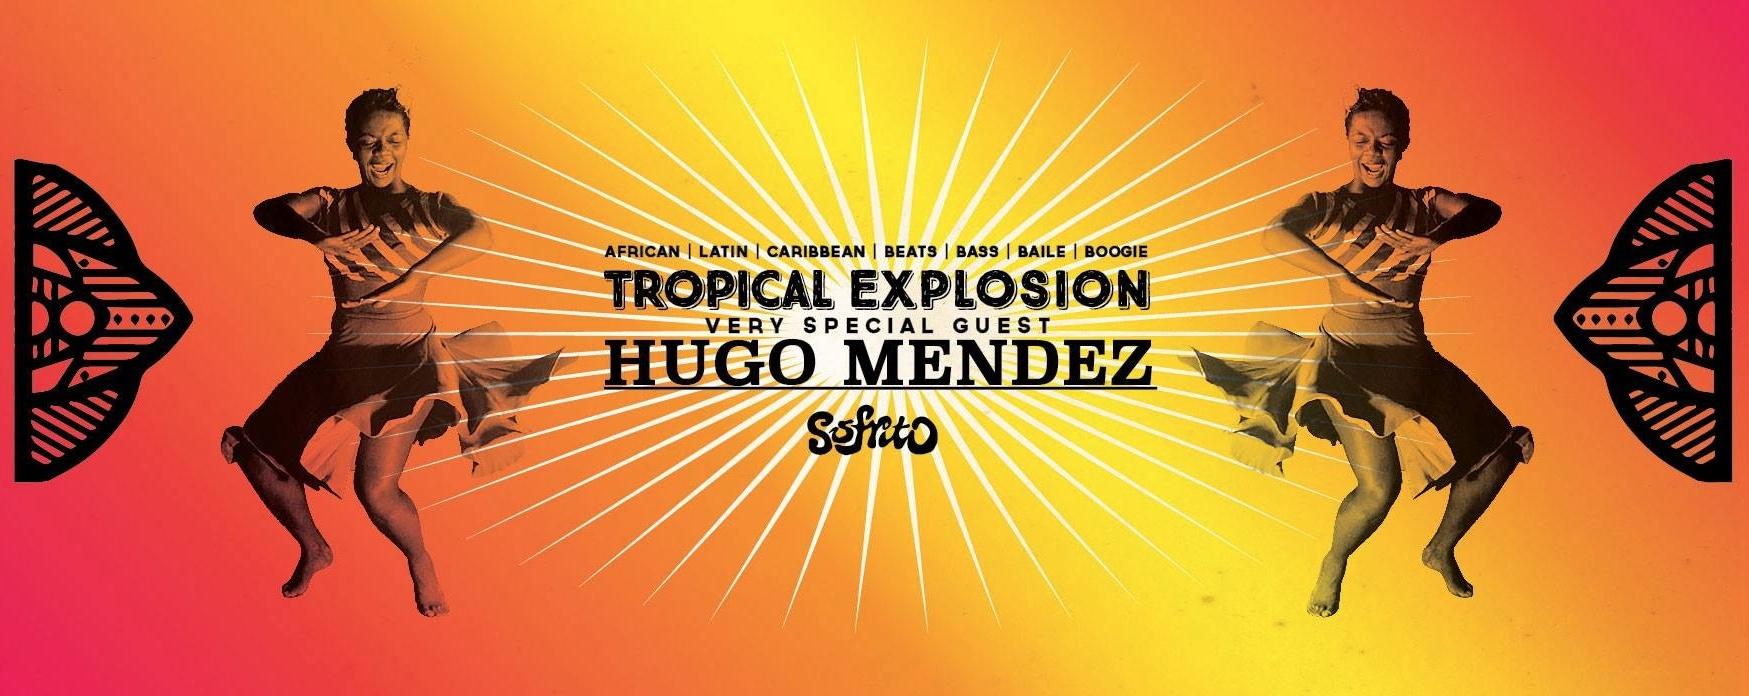 TROPICAL EXPLOSION with Hugo Mendez (SOFRITO)